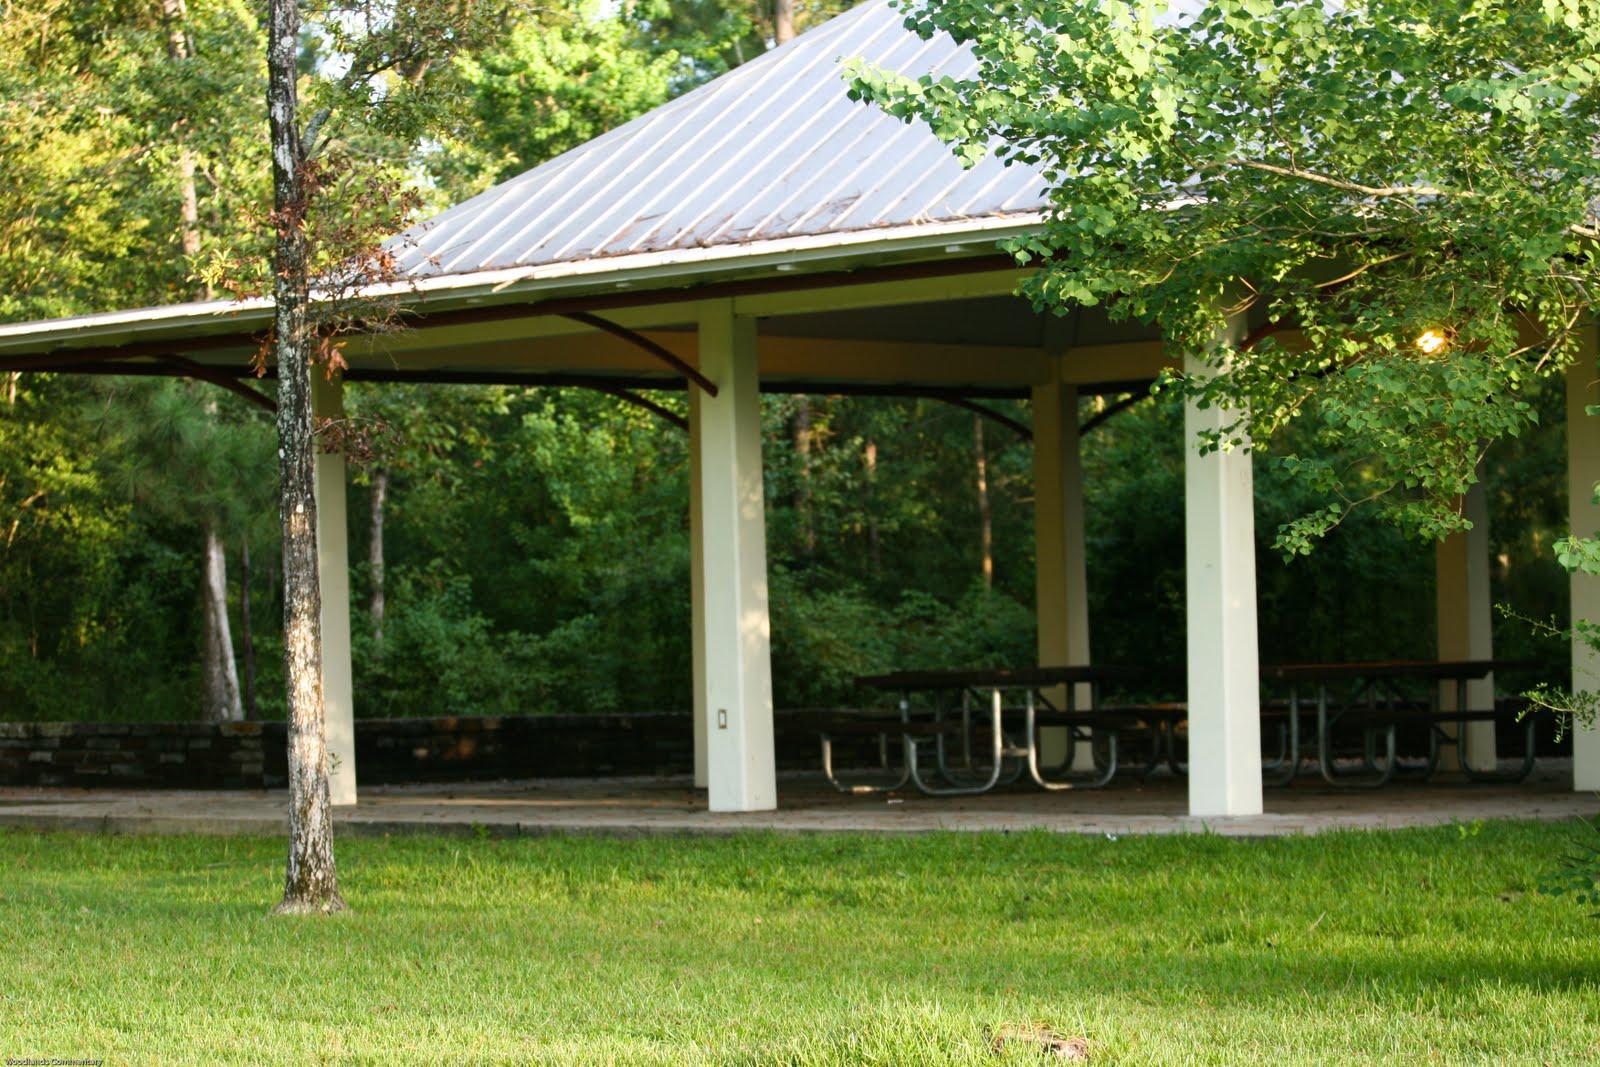 The Woodlands Texas Parks: Sundance Park in The Woodlands